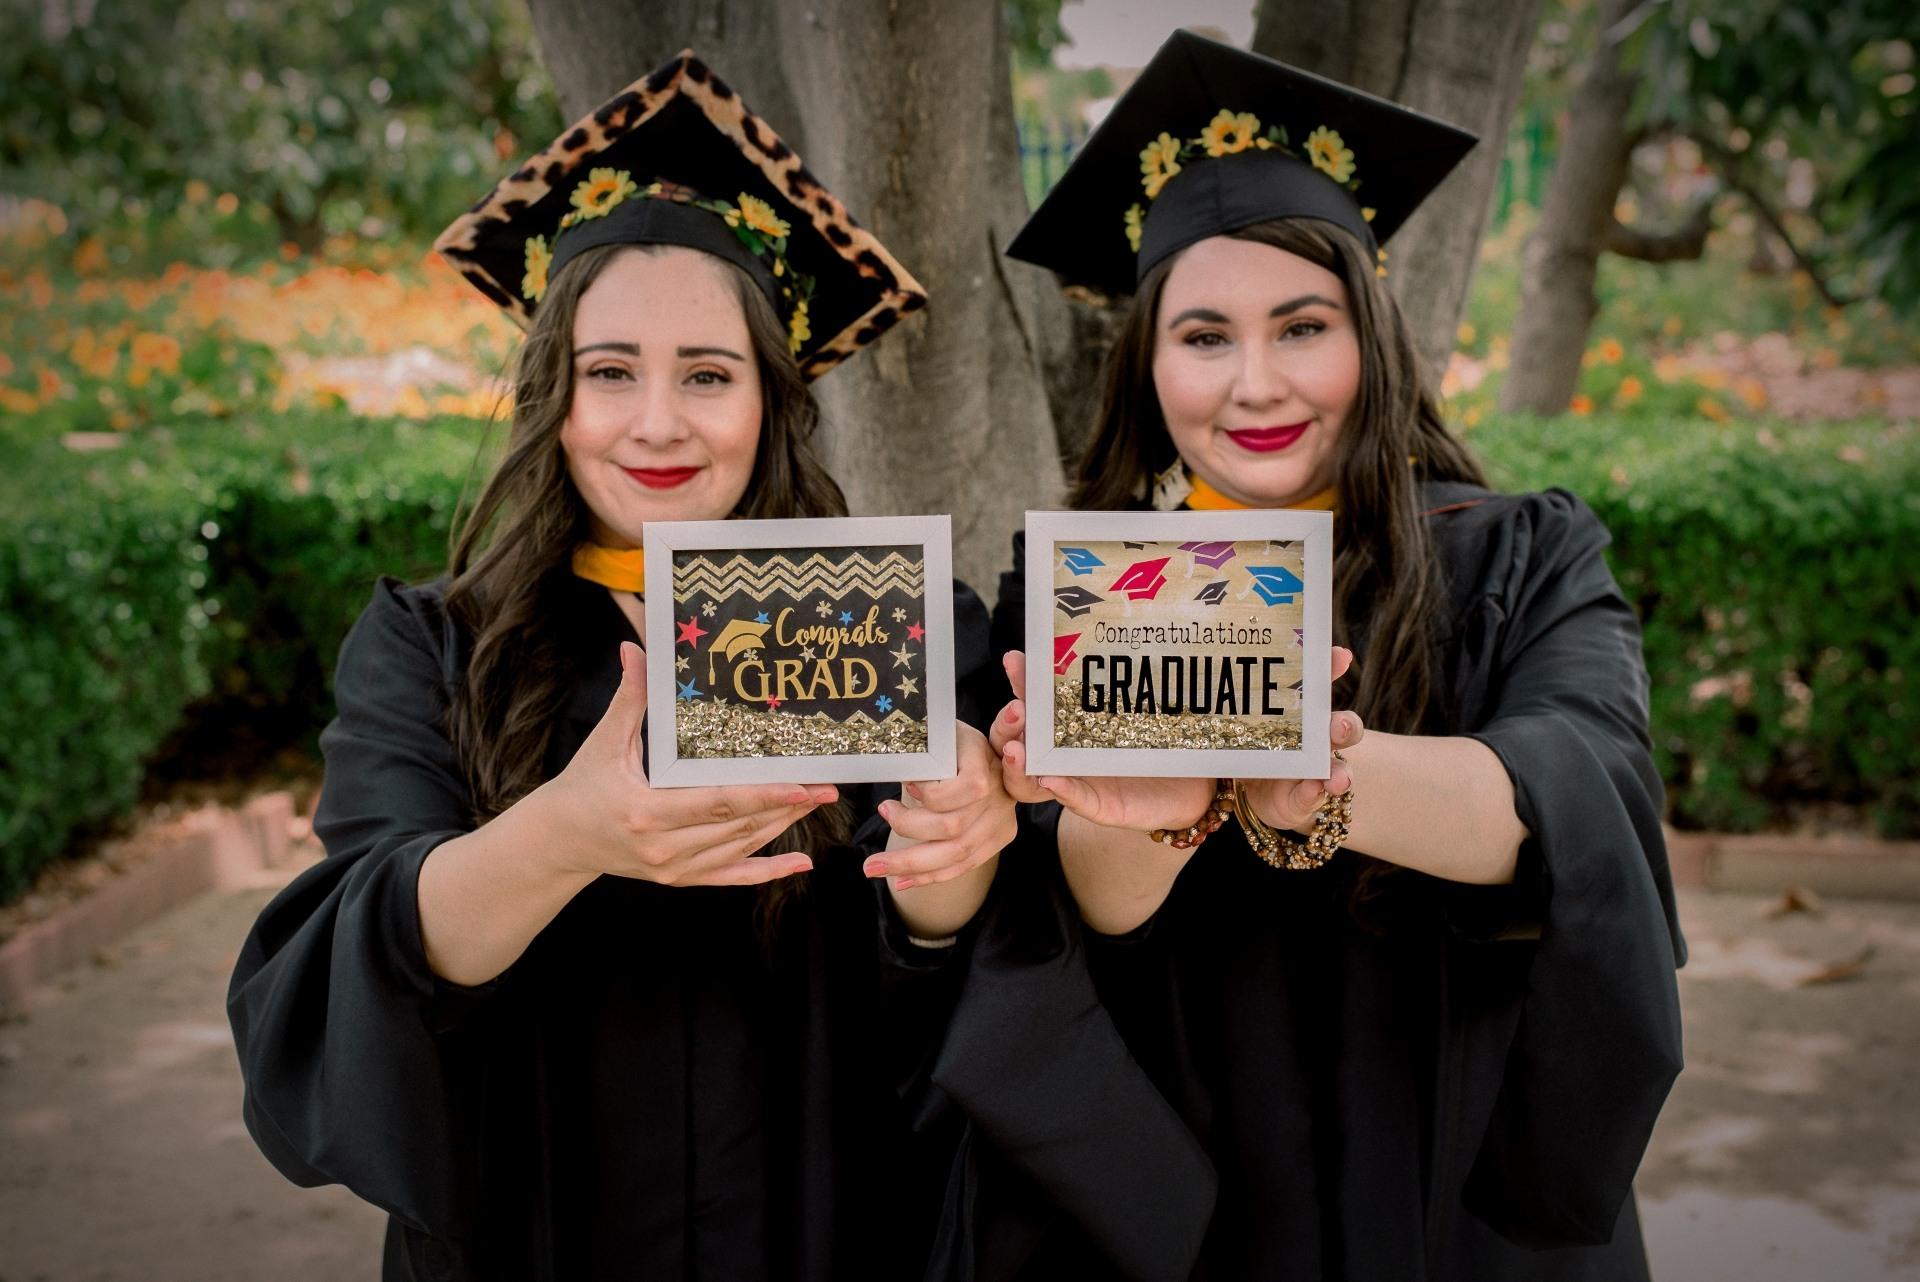 Angela and Stephany celebrate graduation